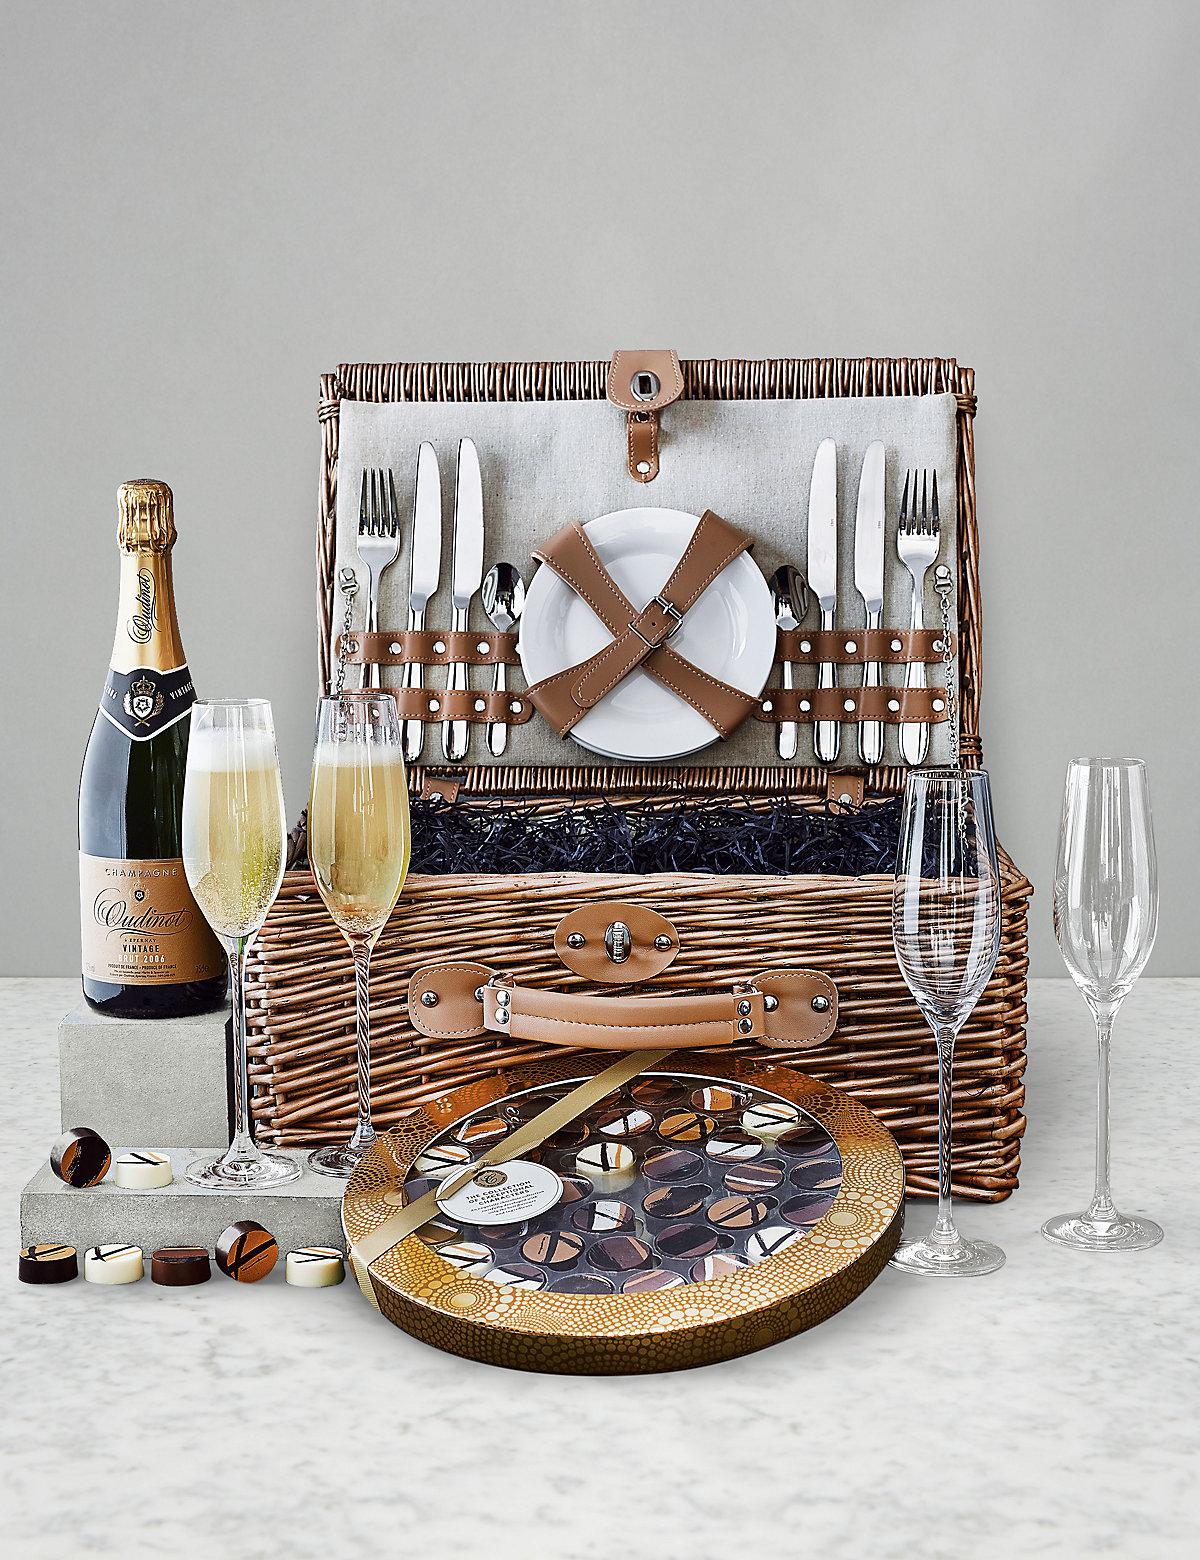 Luxurious Champagne Hamper